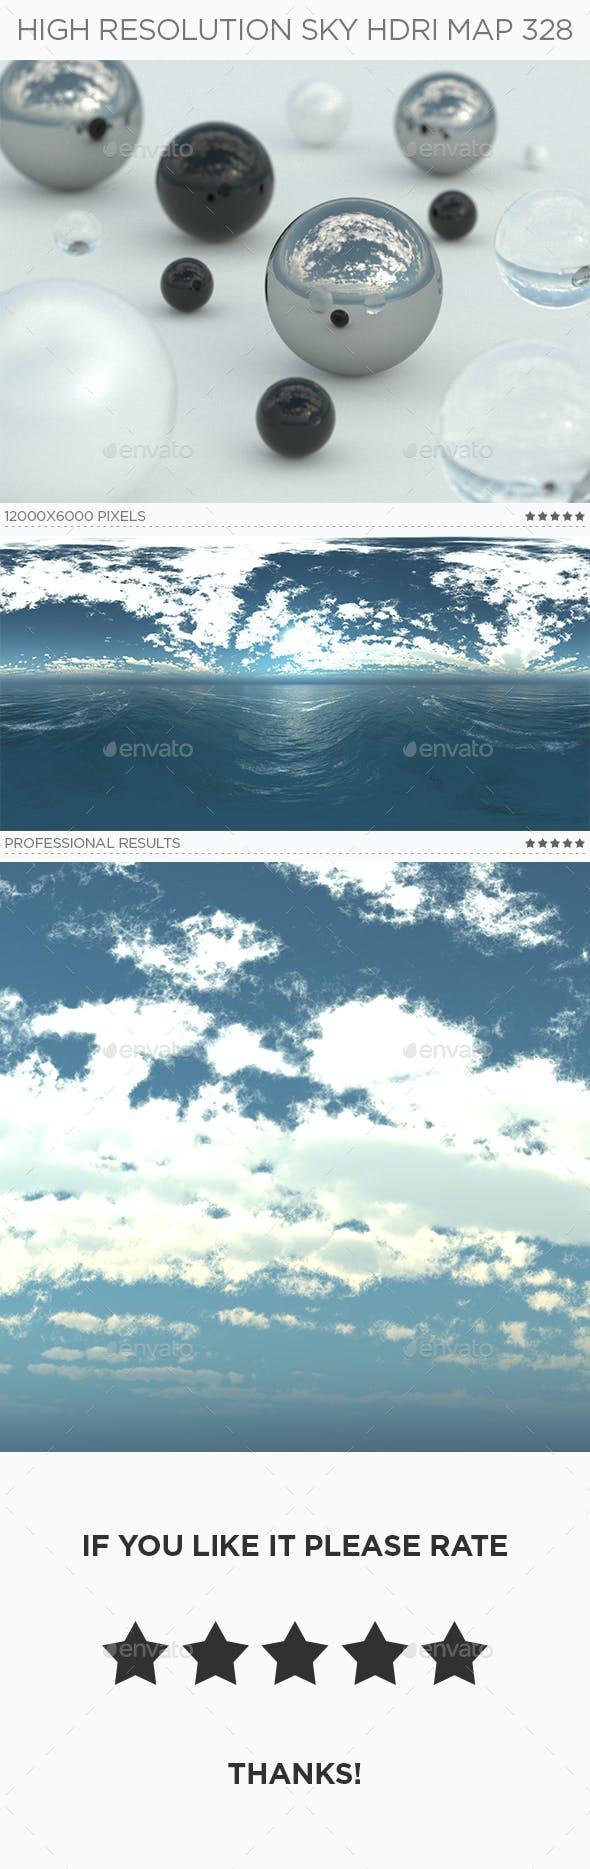 High Resolution Sky HDRi Map 328 - 3DOcean Item for Sale